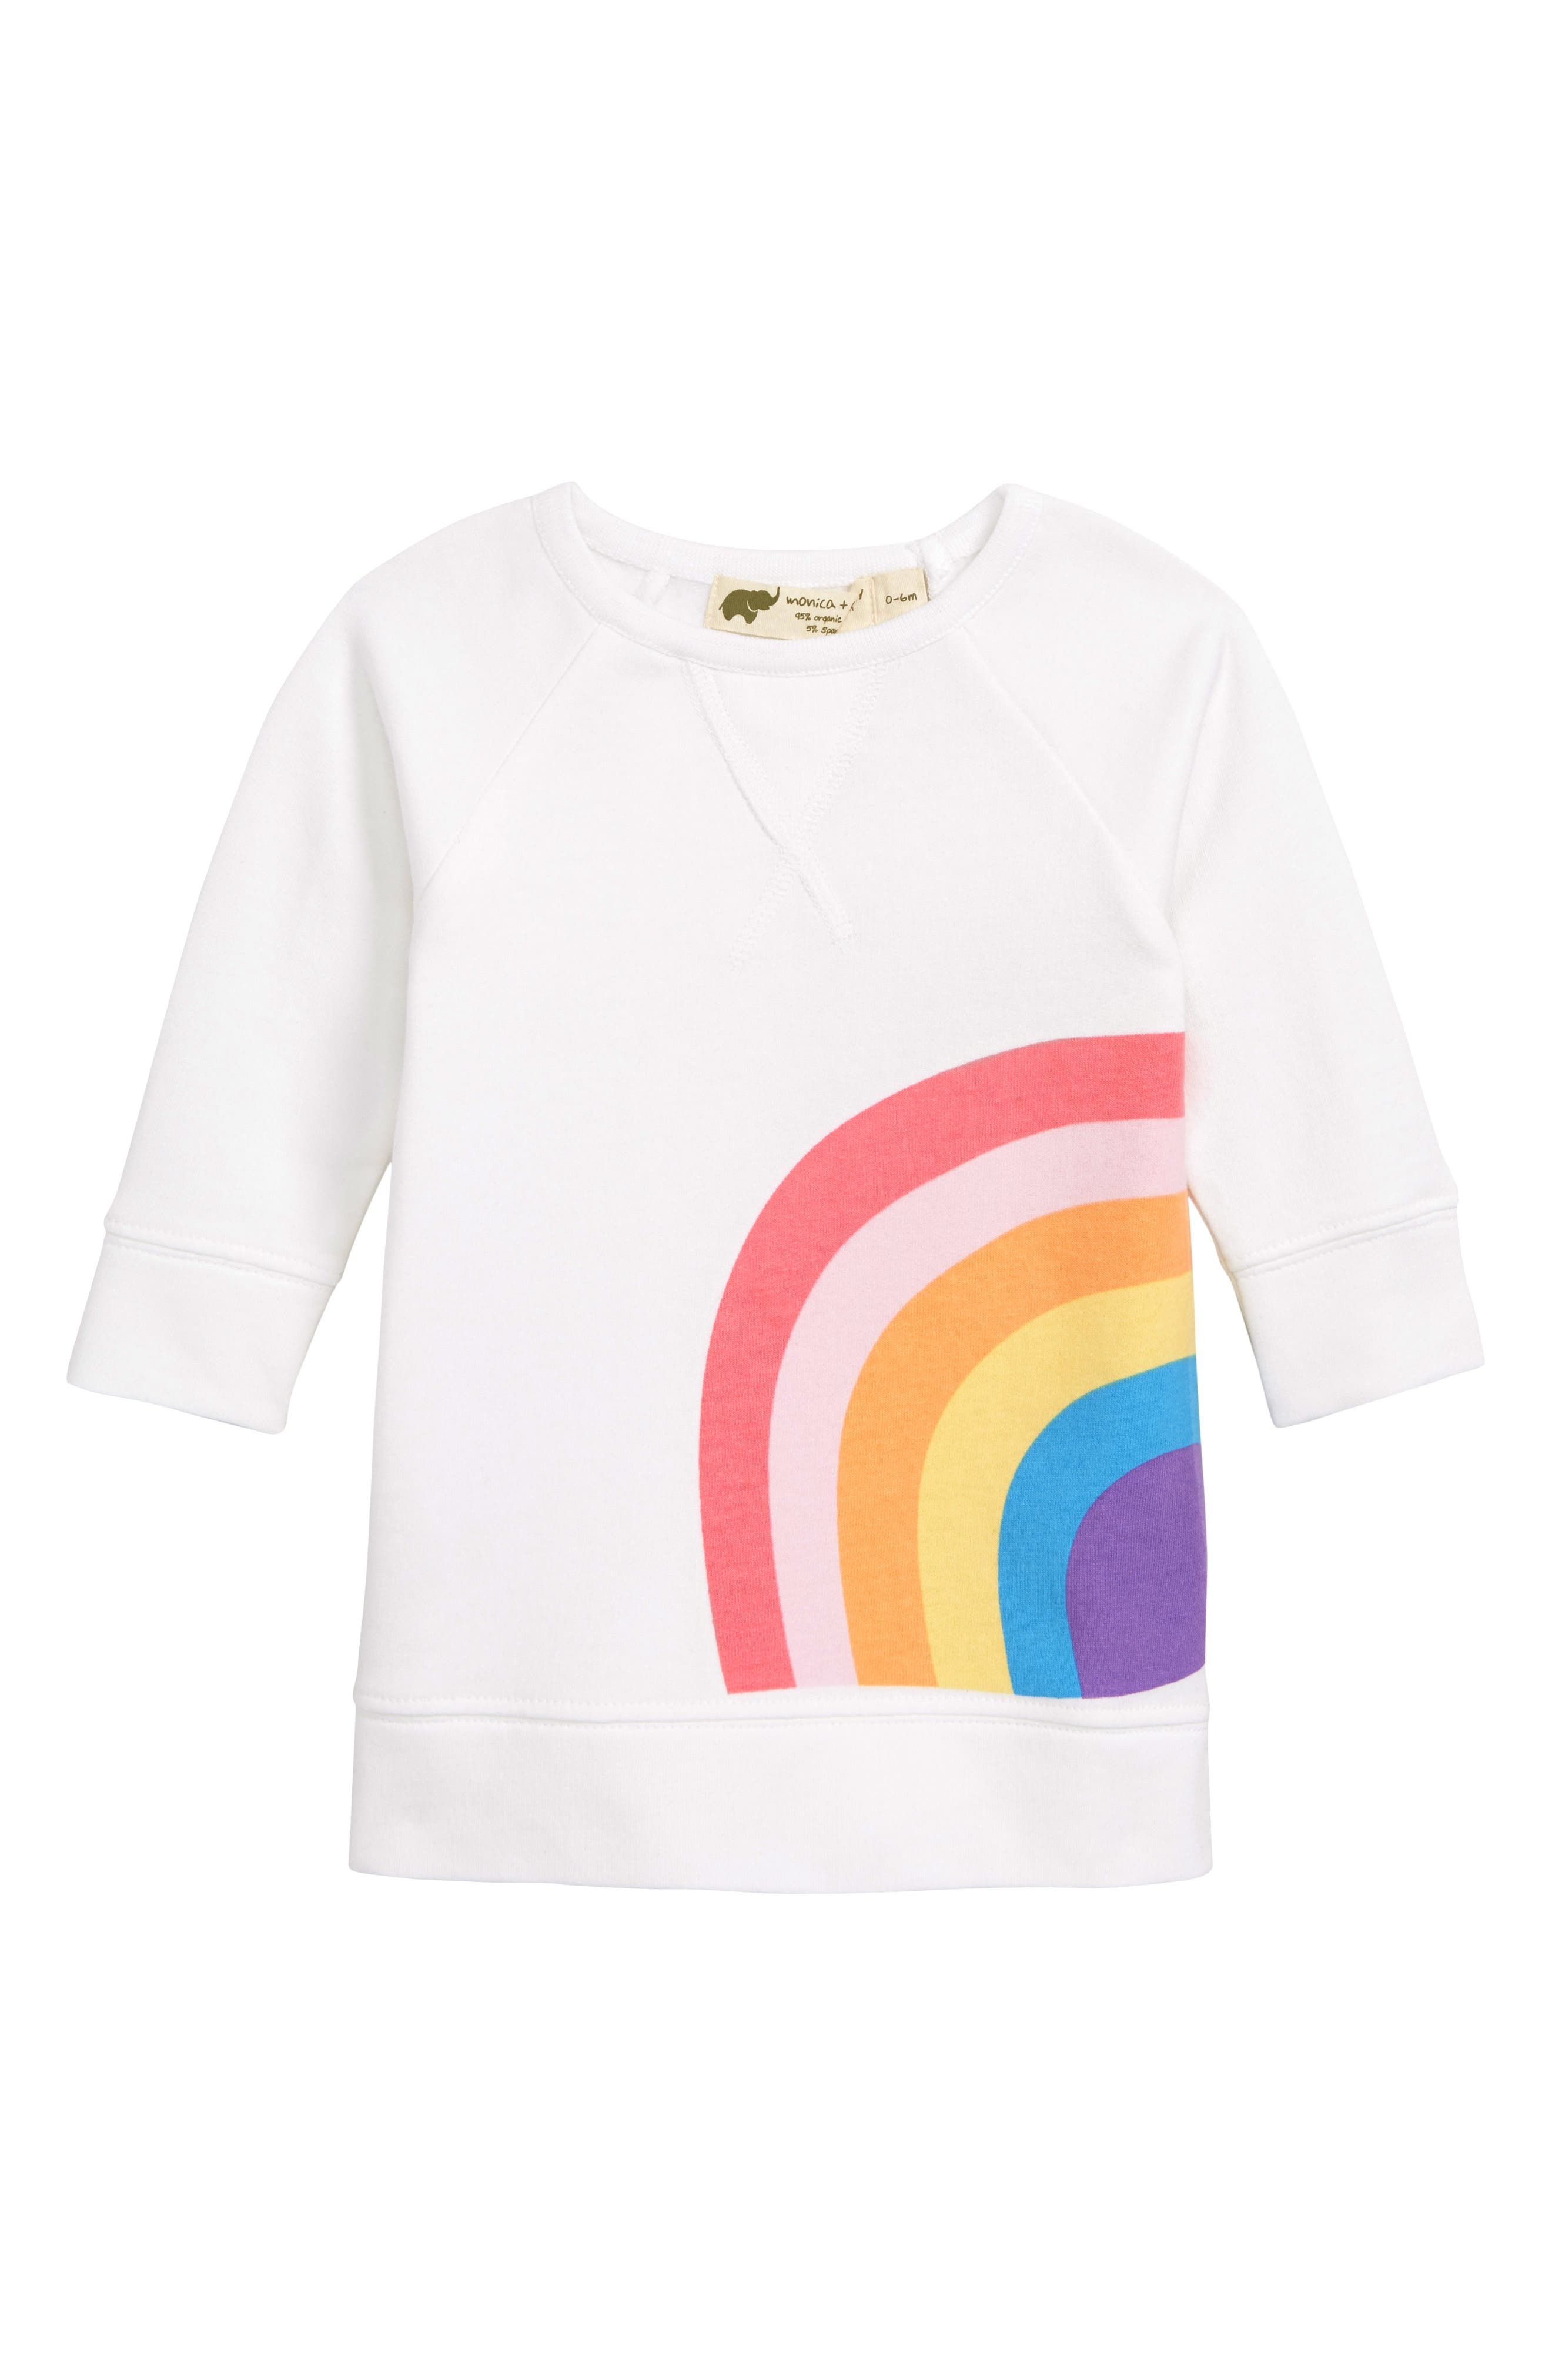 MONICA + ANDY, Varsity Sweatshirt Dress, Main thumbnail 1, color, 100